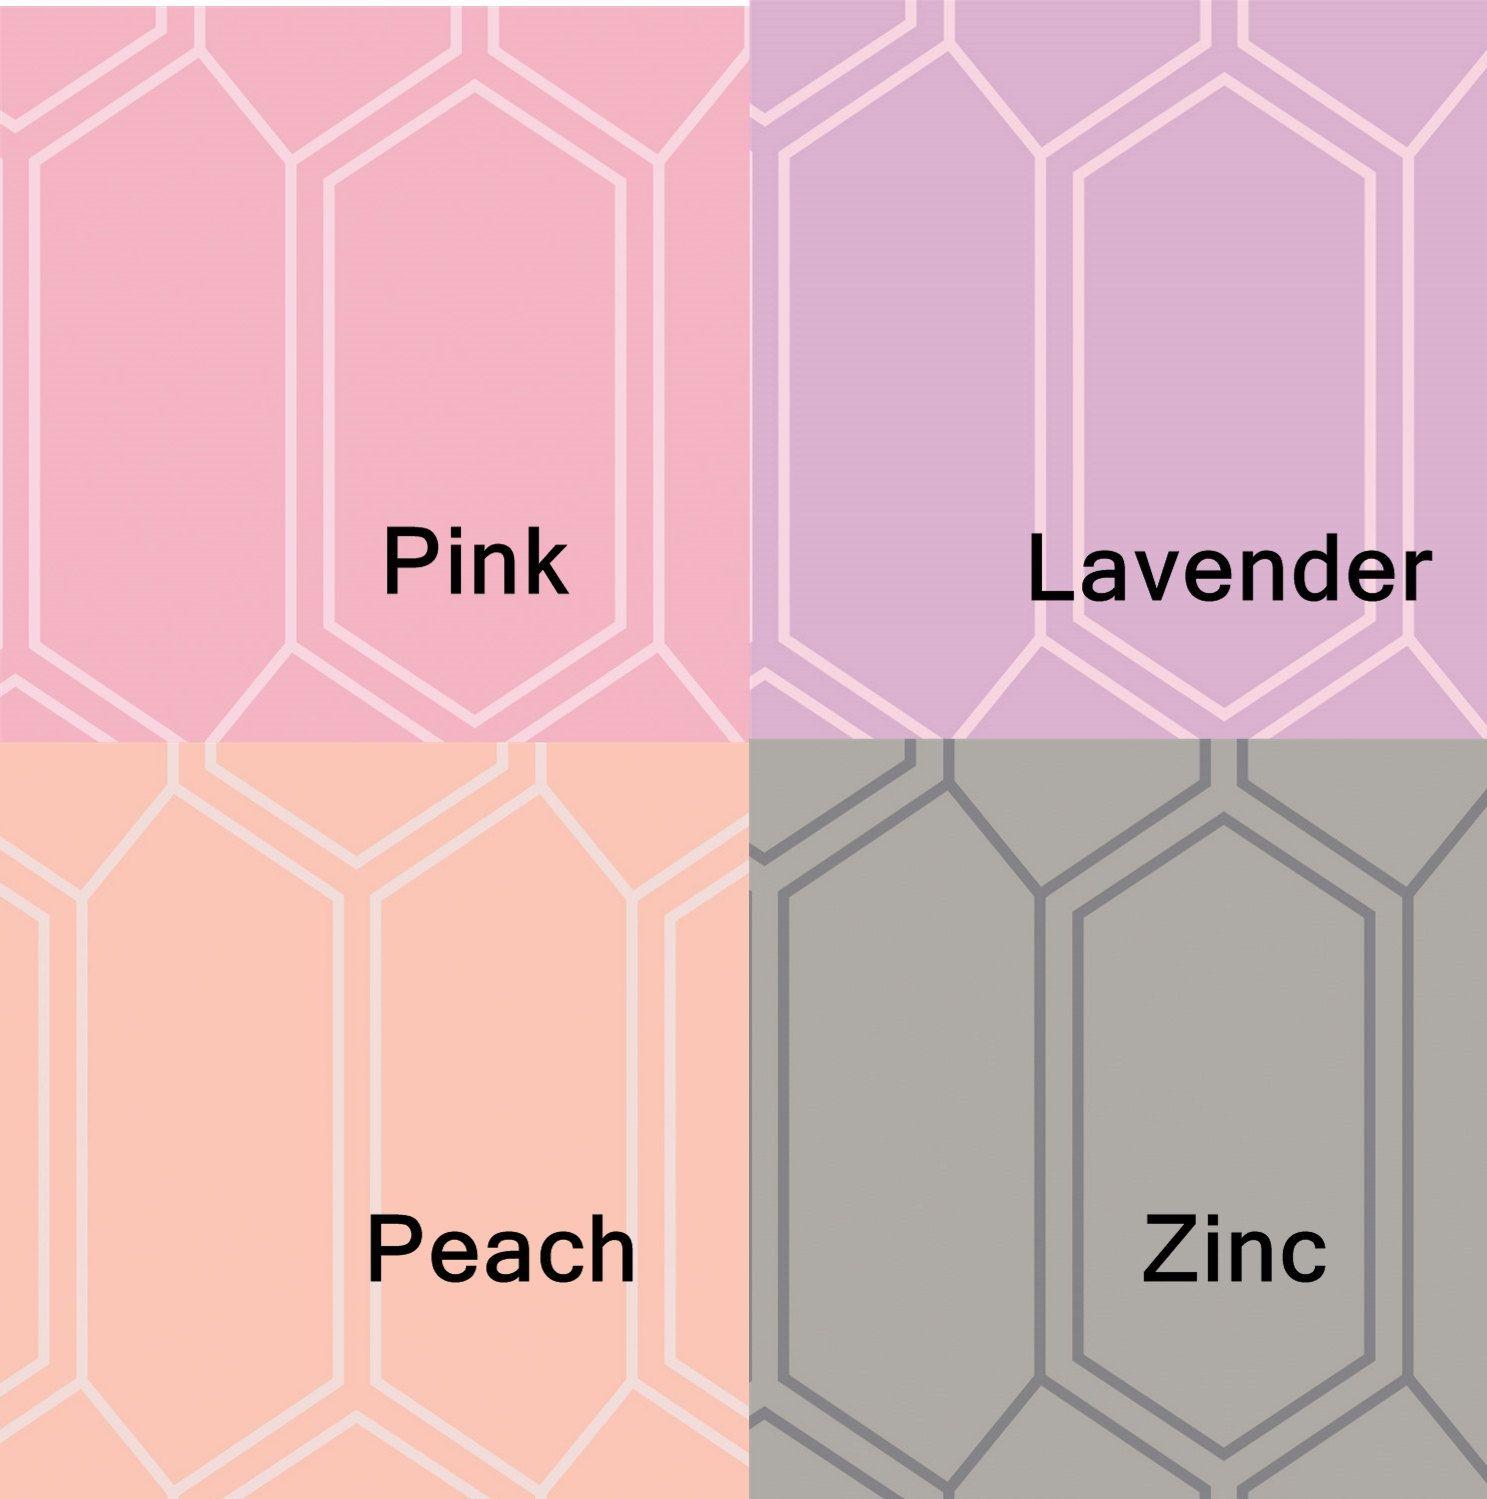 Bees Nest in Pink, in Lavender Purple, in Peach, in Zinc Grey ...